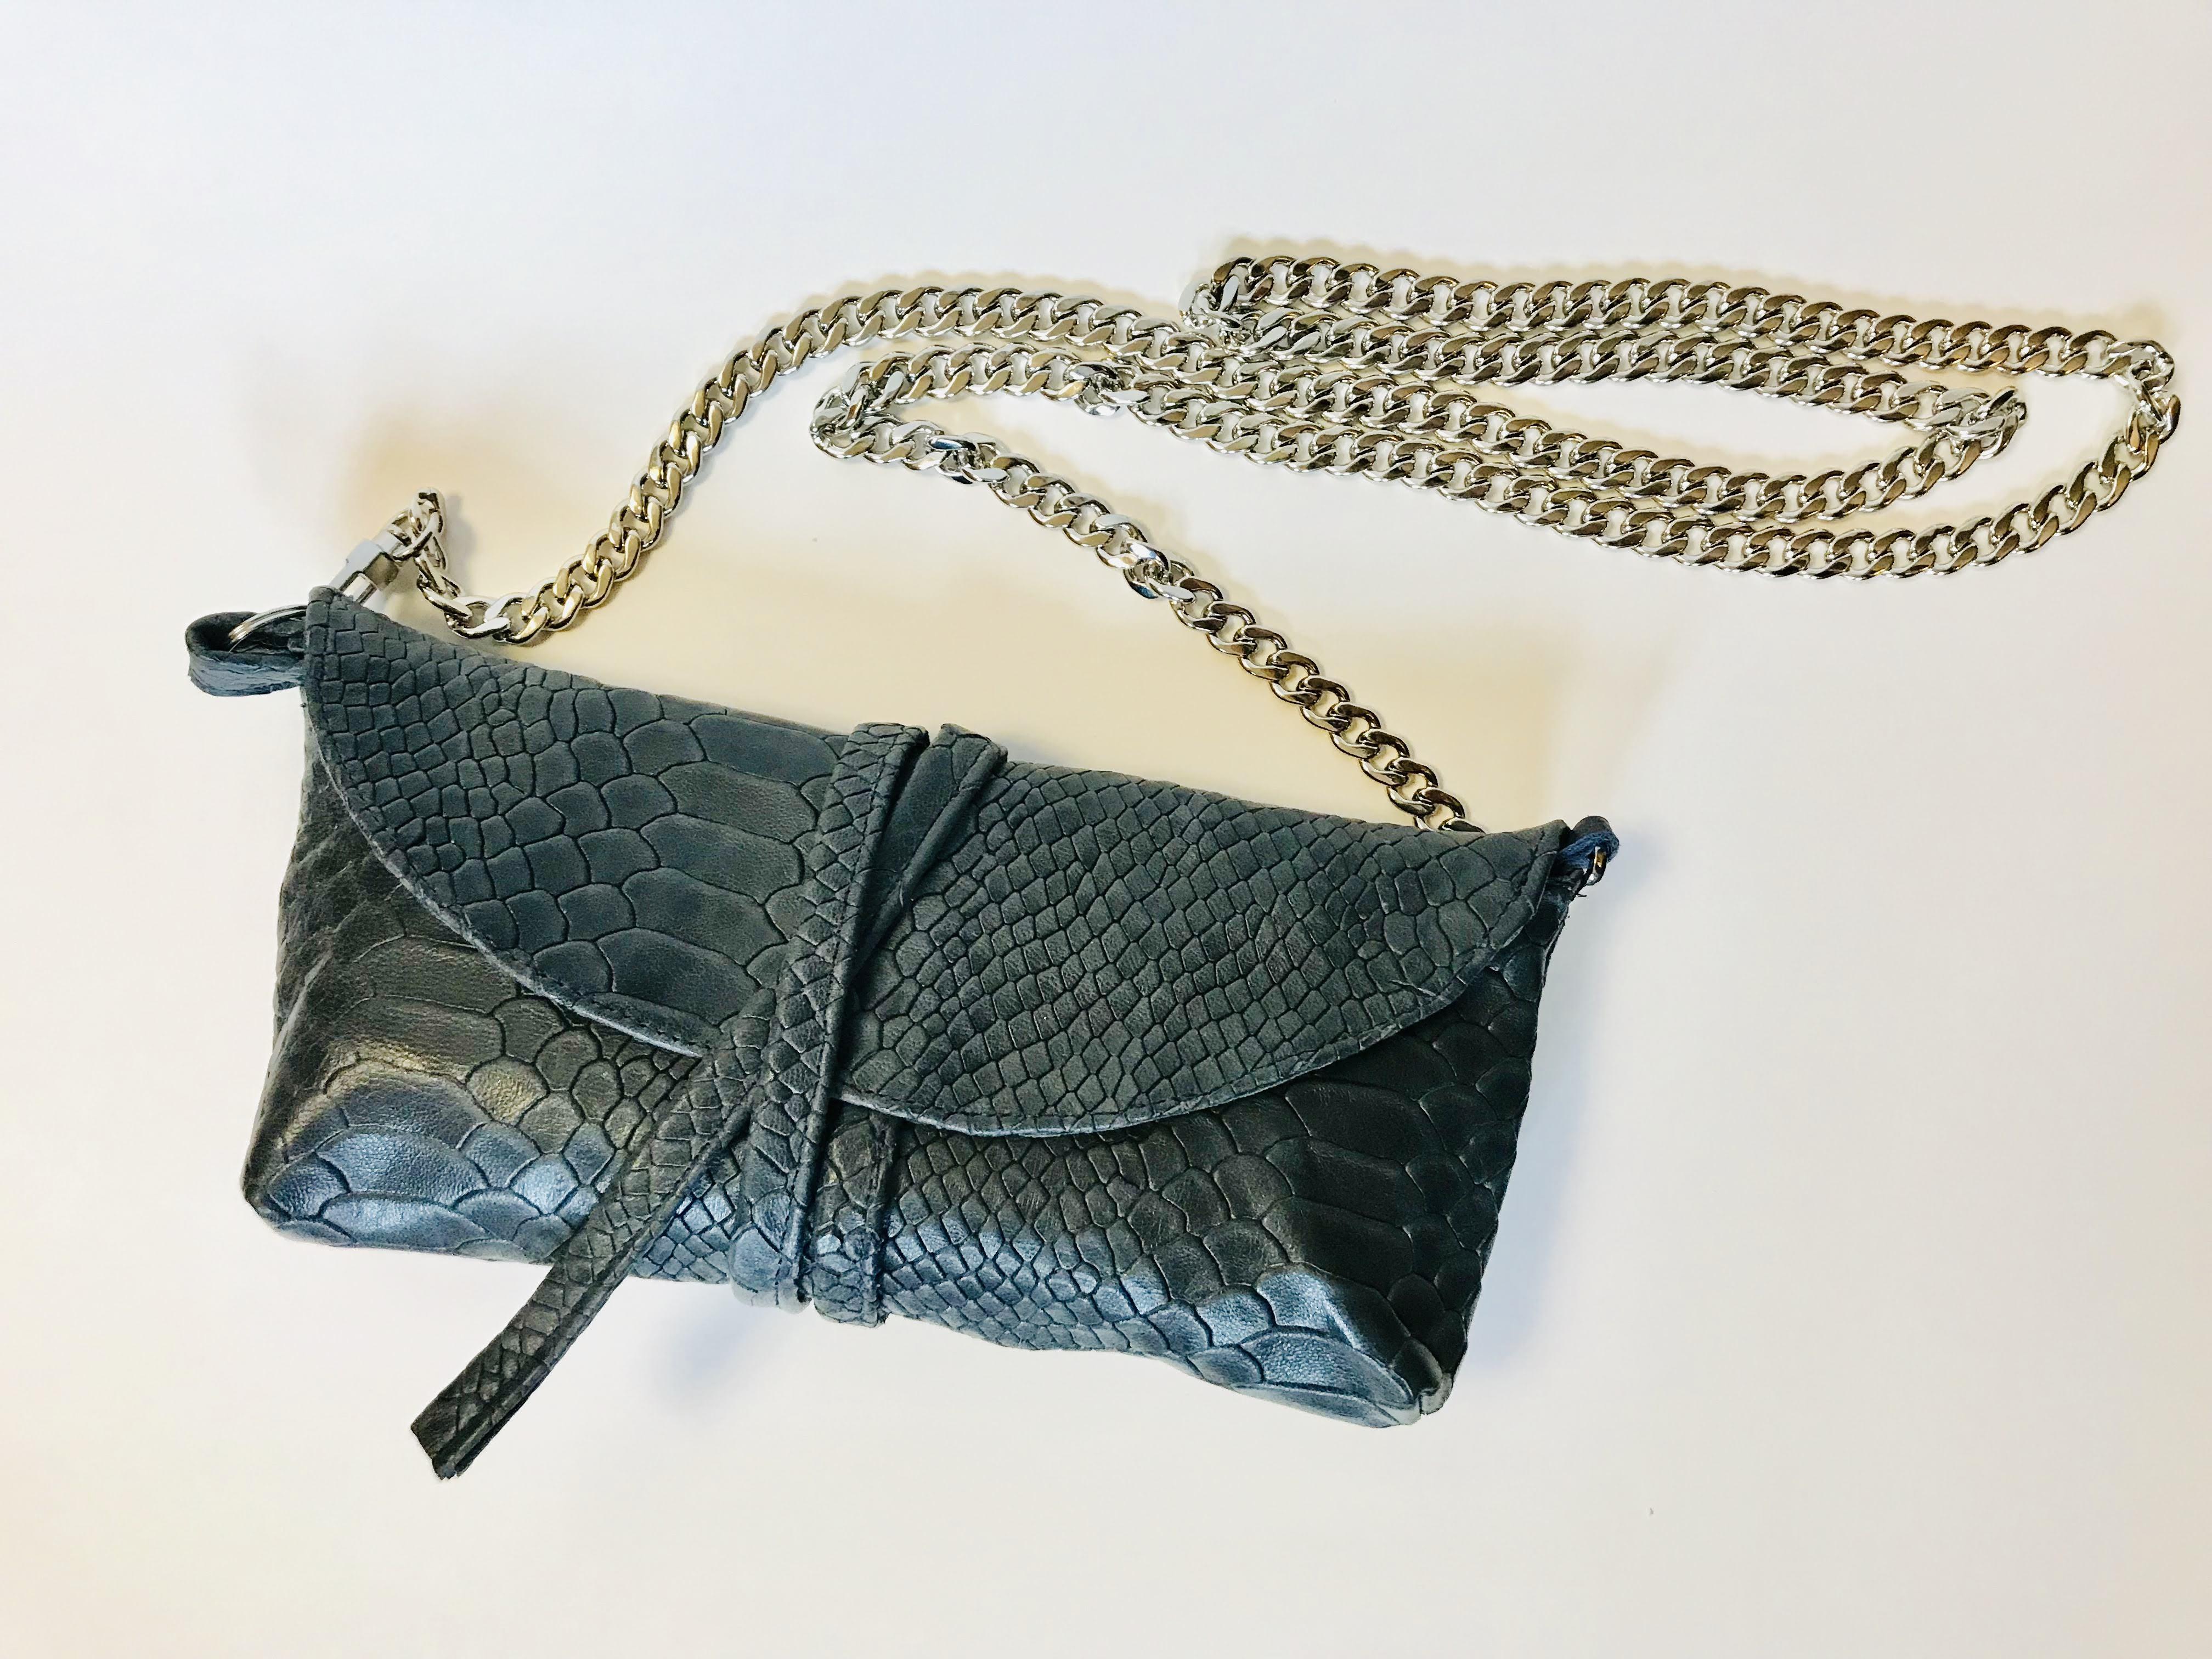 Snakeskin Clutch/Crossbody Bag